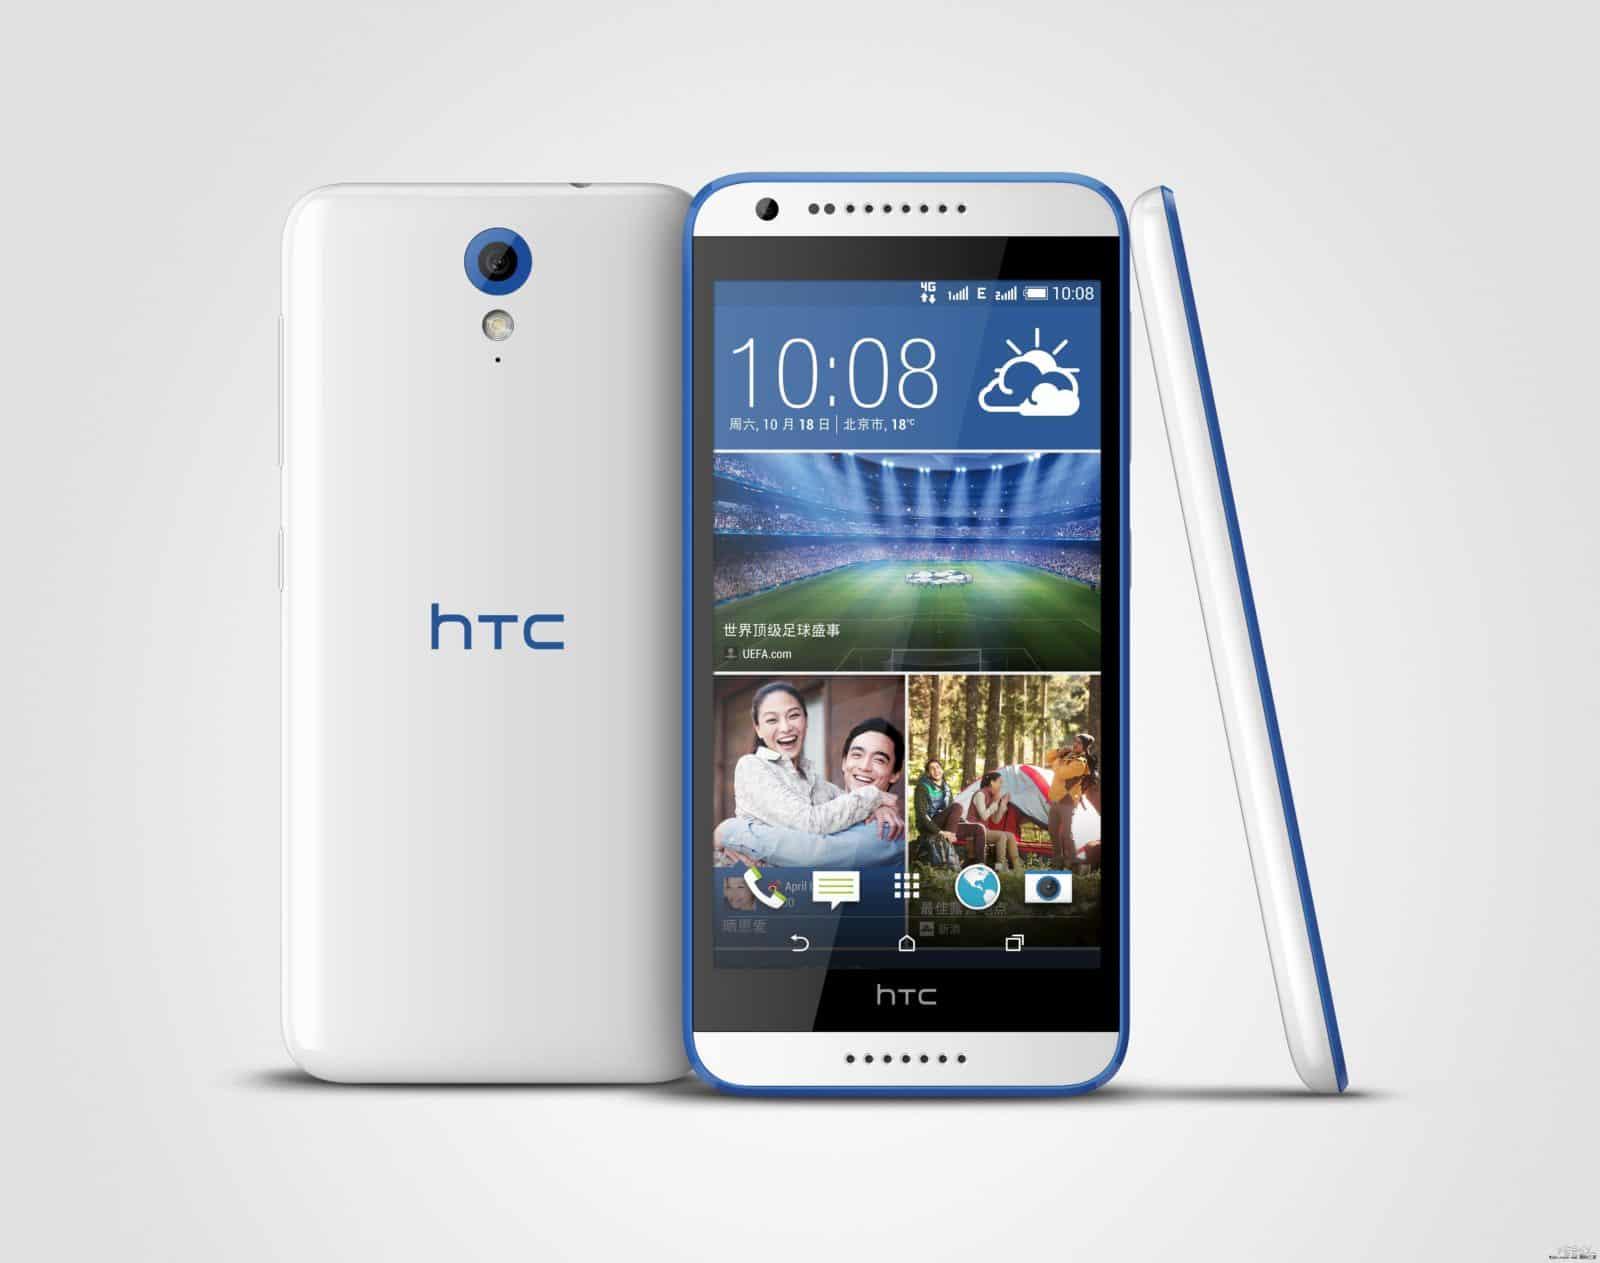 HTC Desire 820 Mini (D820mu) pre-announcement listing_1